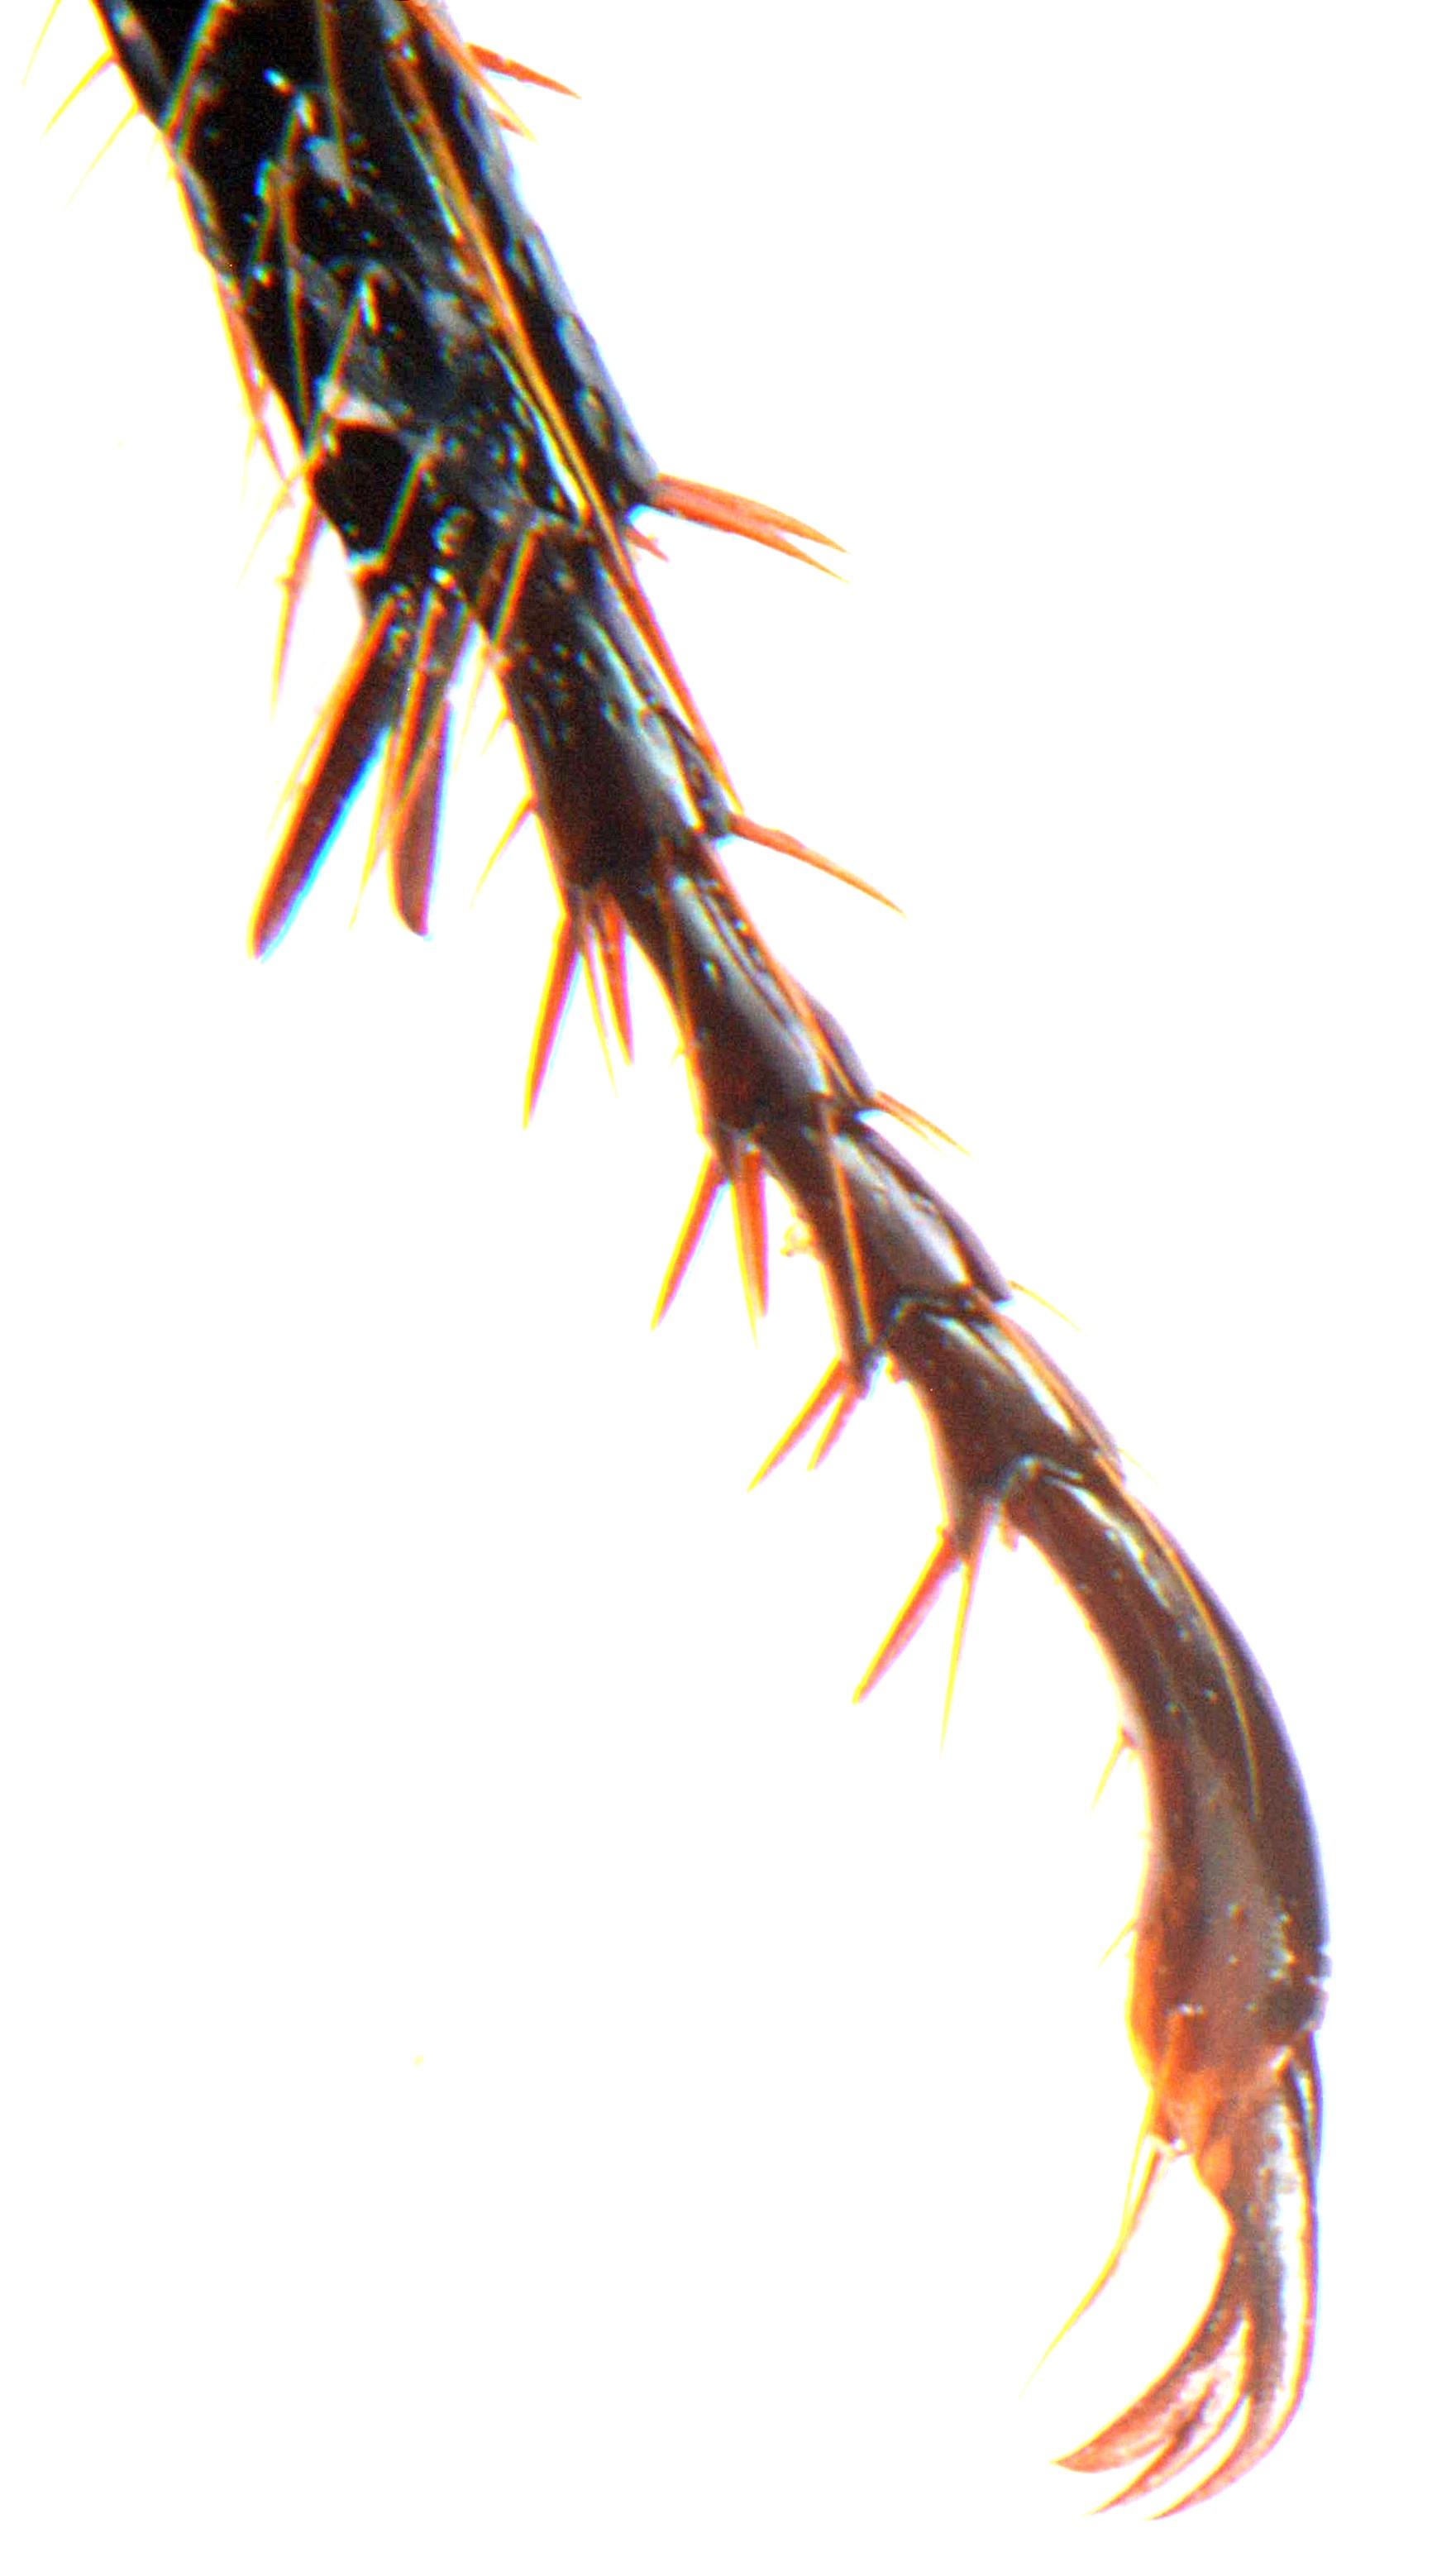 Anomala dubia mid claw